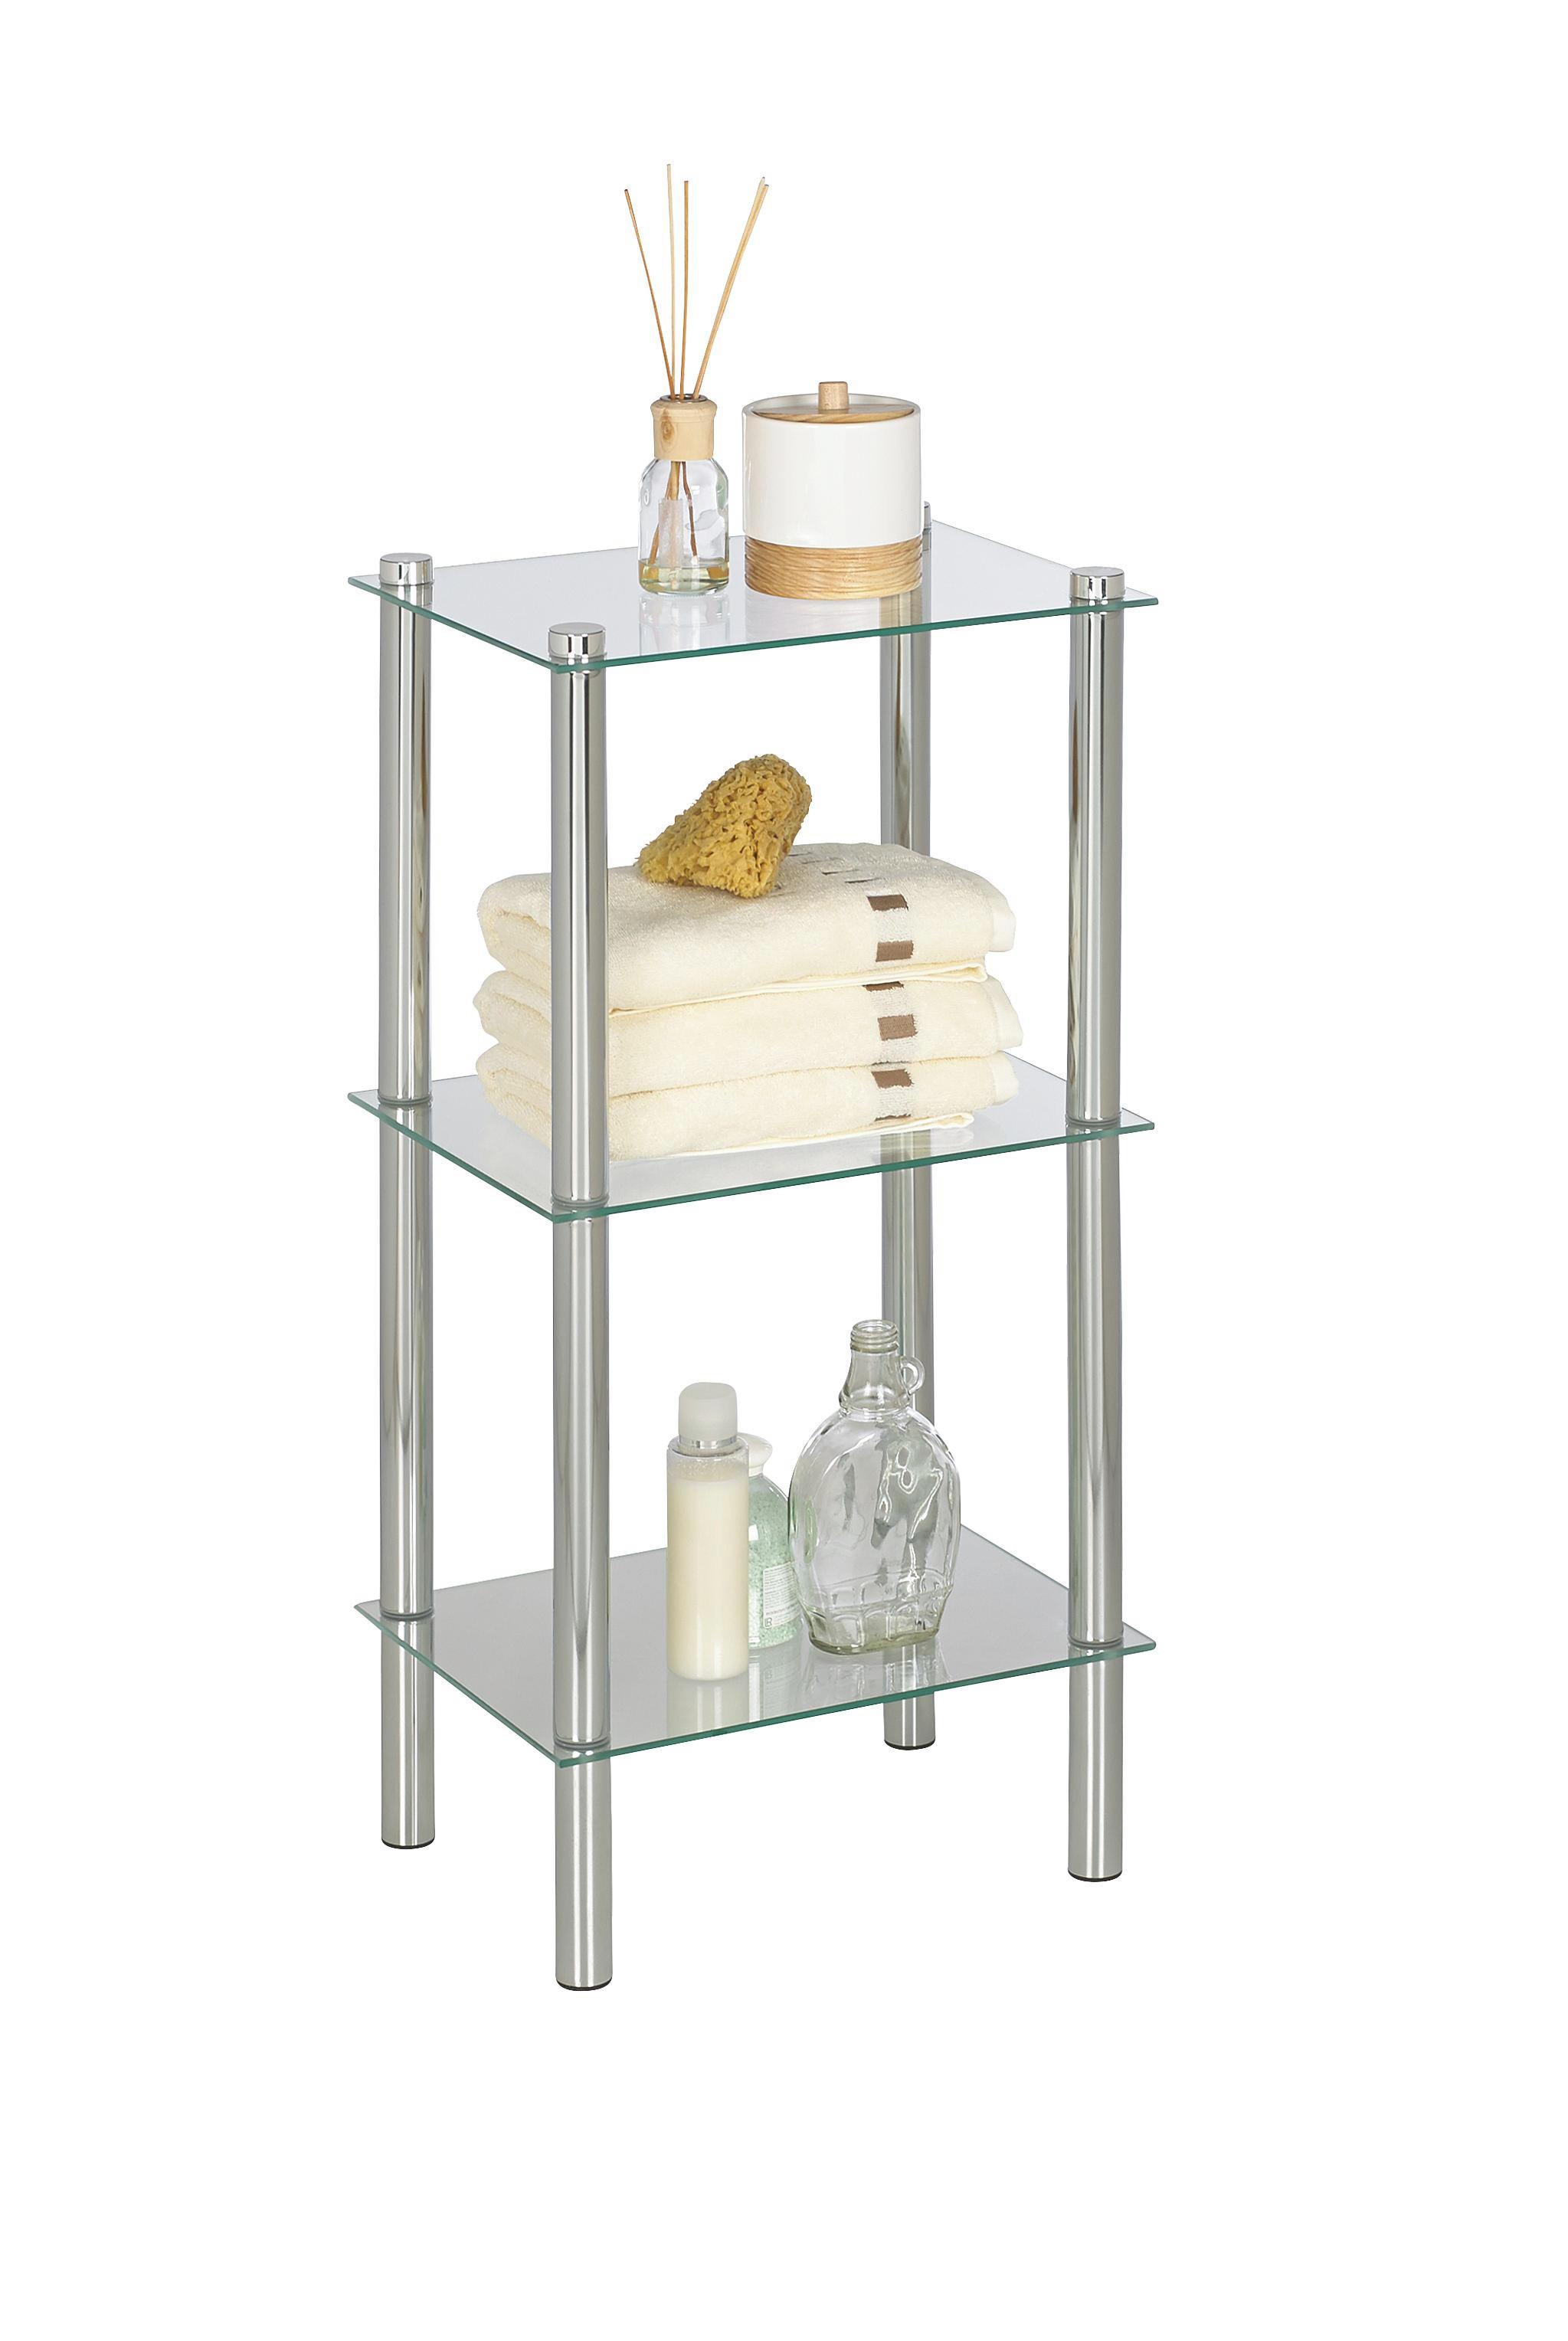 BADEZIMMERREGAL   Chromfarben/Klar, Design, Glas/Metall (38/75/